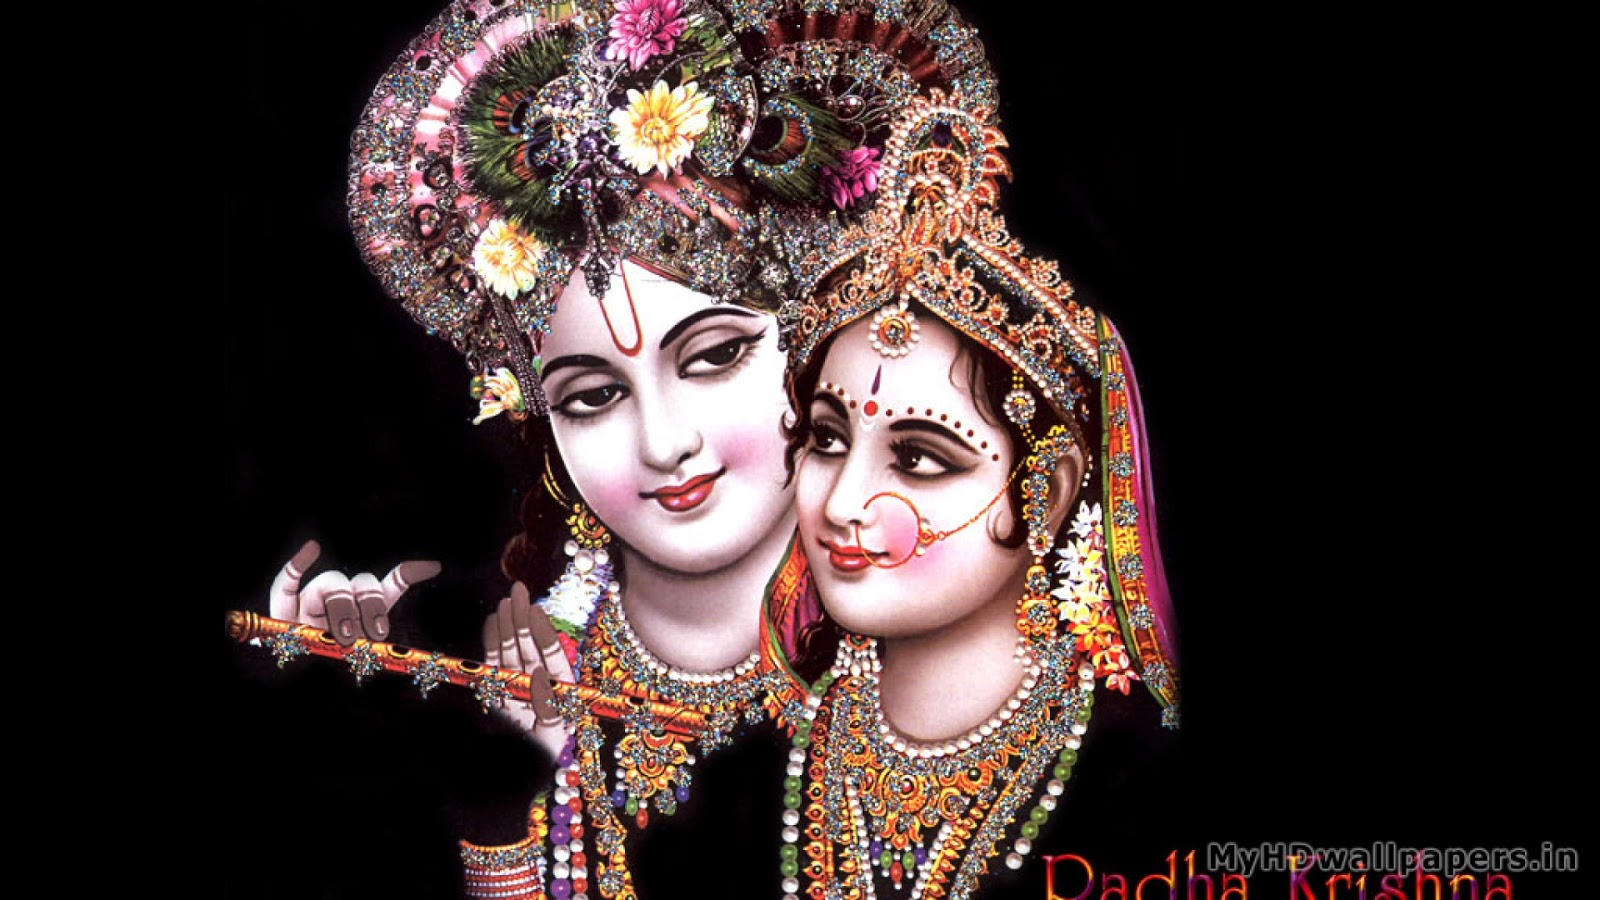 itayanagi hindu personals Meta-inf/manifestmfmeta-inf/souyidaisfmeta-inf/souyidairsaandroidmanifestxmlassets/customconfigpropertiesassets/georgiattfassets/lib/hackdexres/anim/abc_fade.